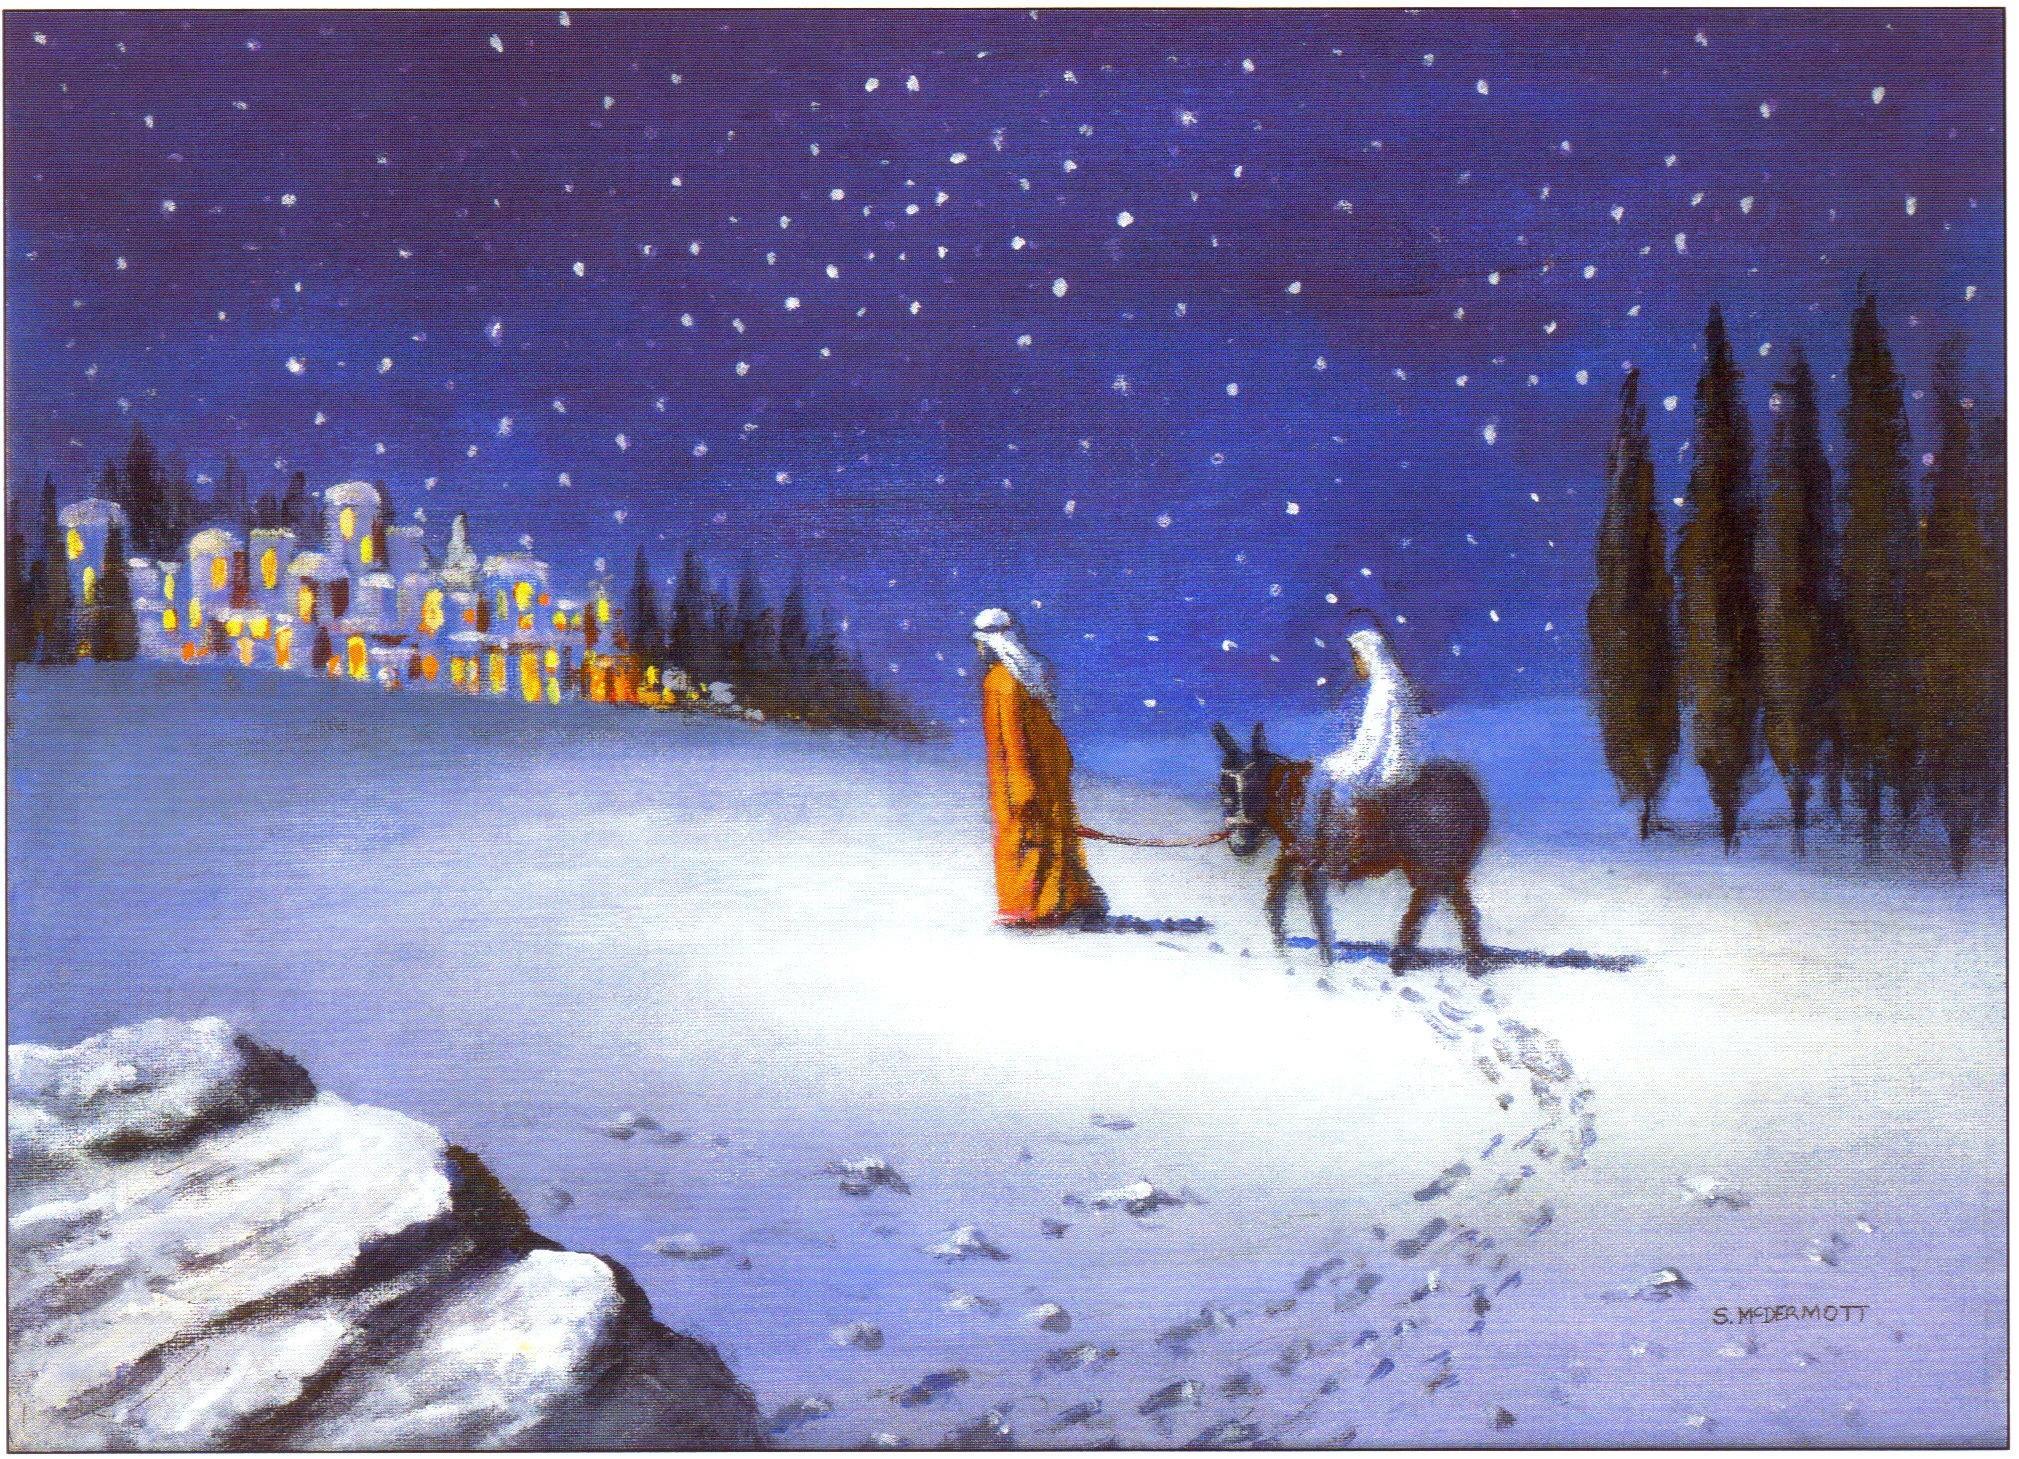 Religious Christmas Wallpaper